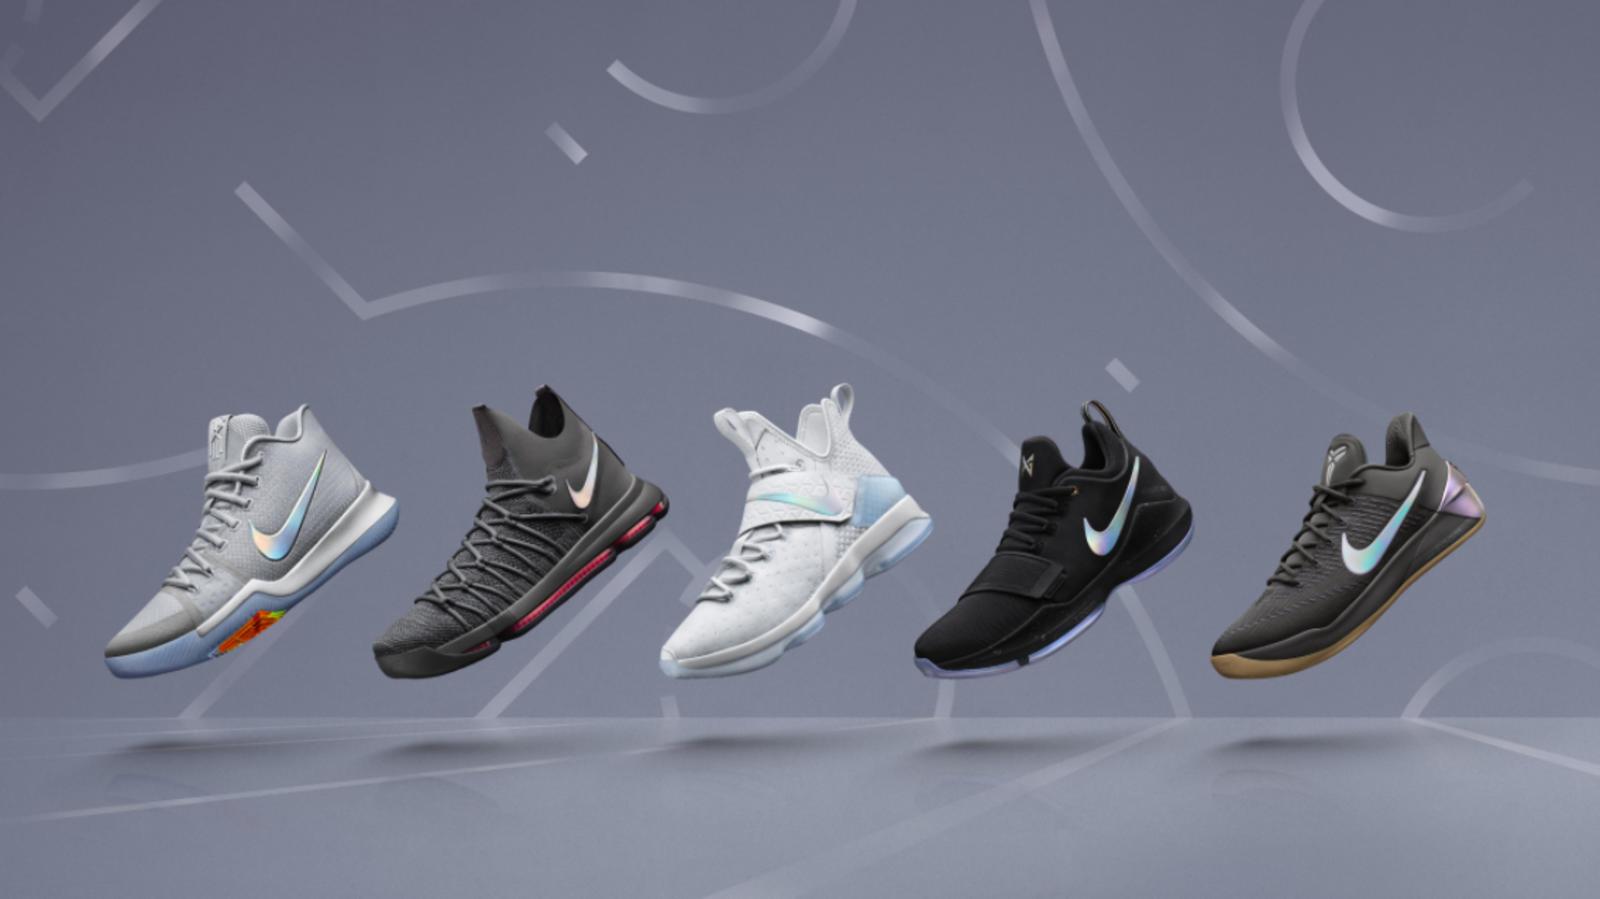 Nike's new KD9 Elite Shoe Line.